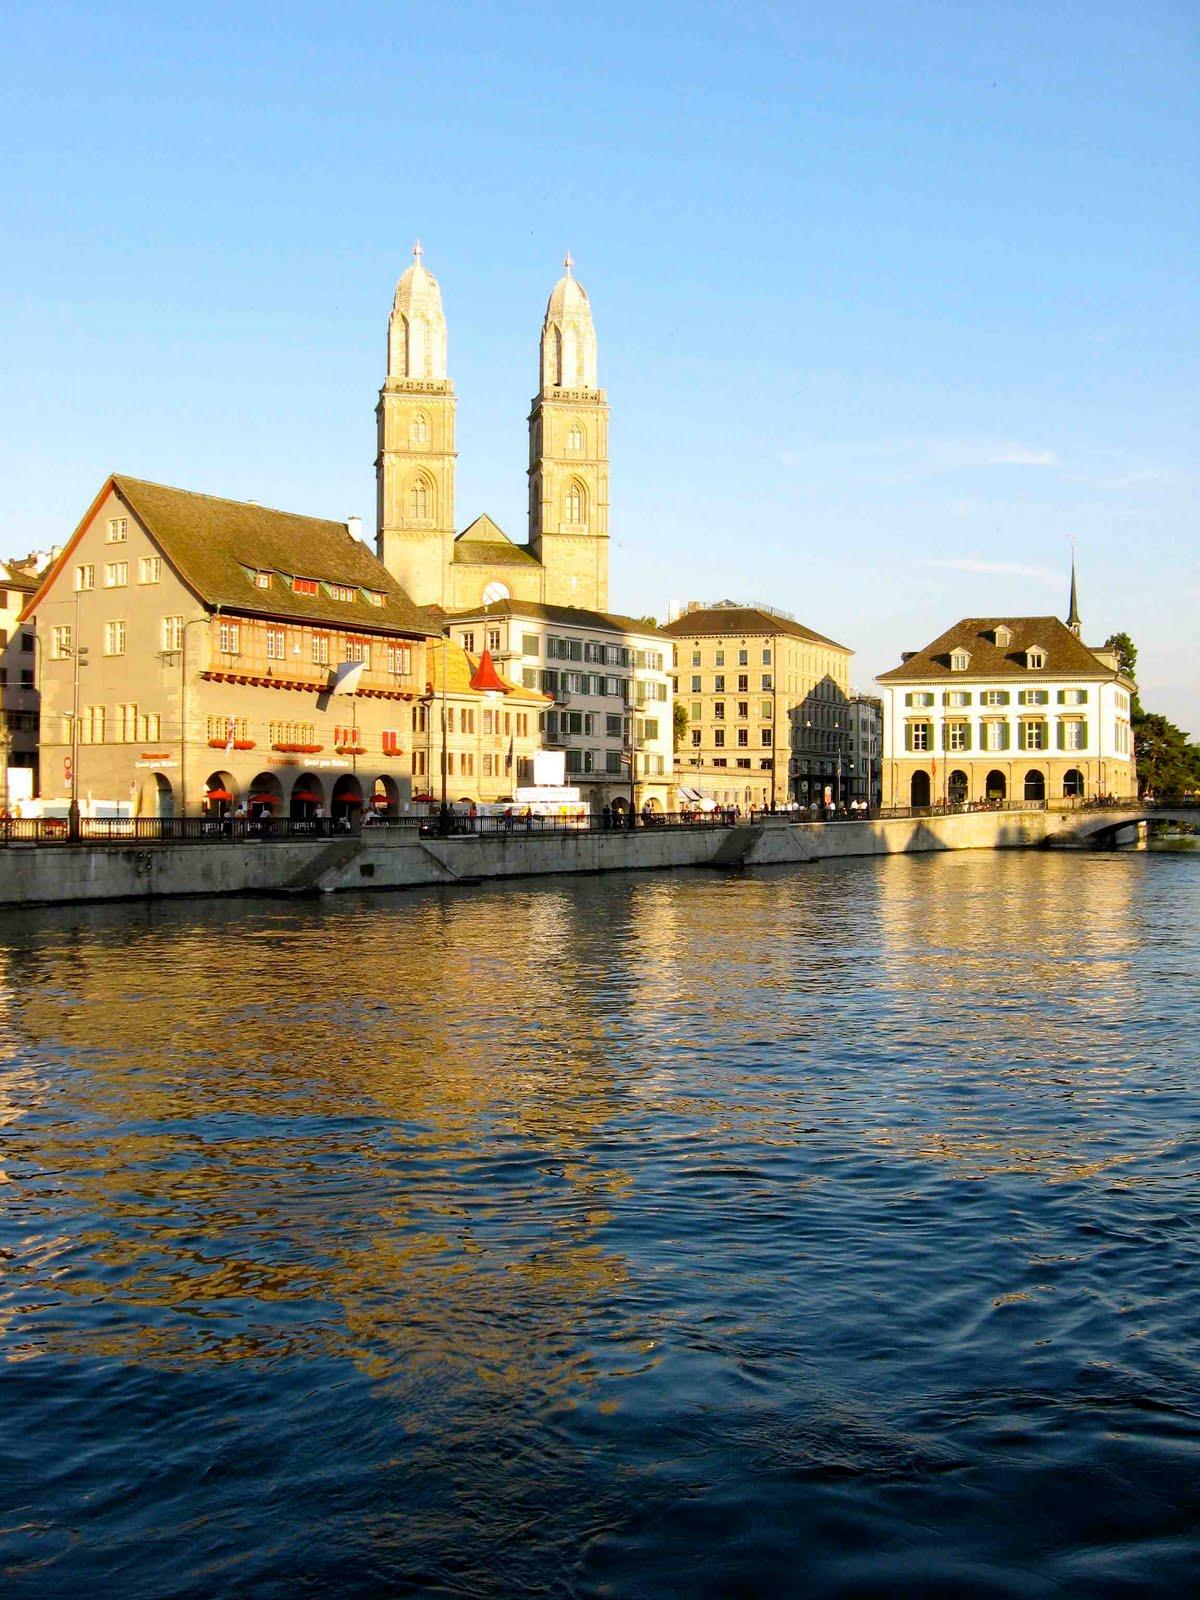 One Big Yodel  Take off your Top  Zurich Swim Culture 9eda69715653